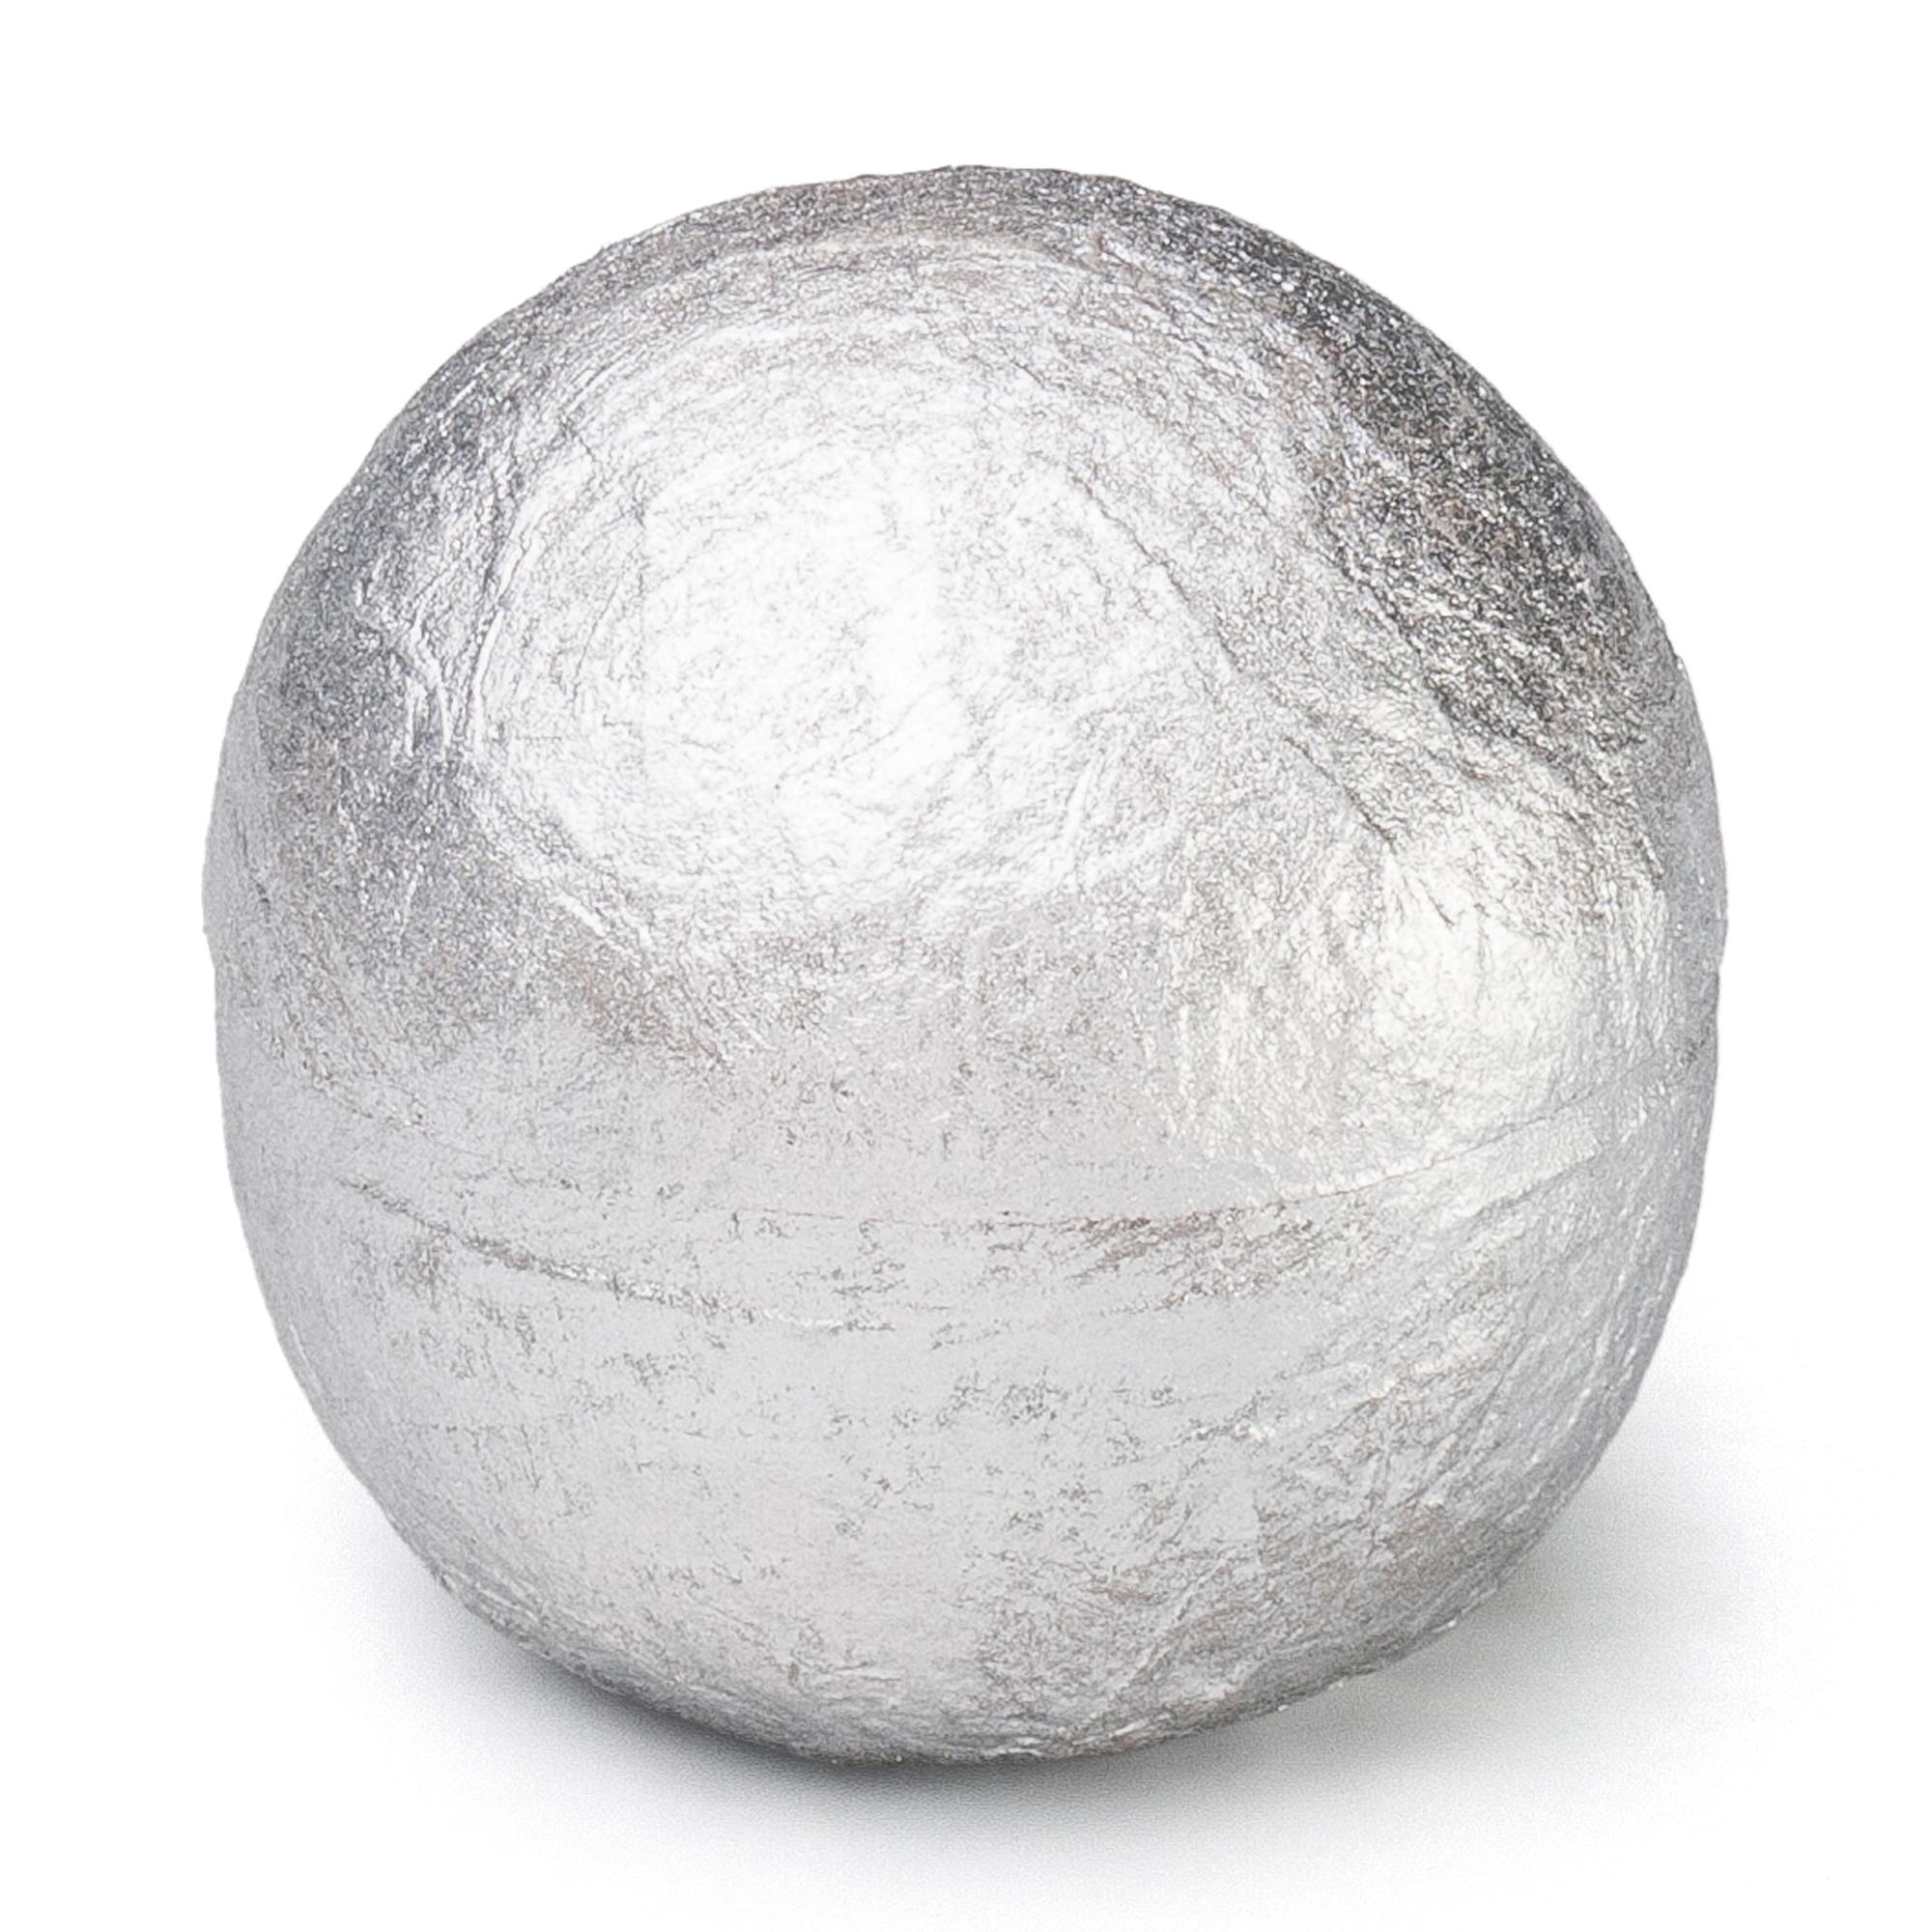 BALLBOX silver